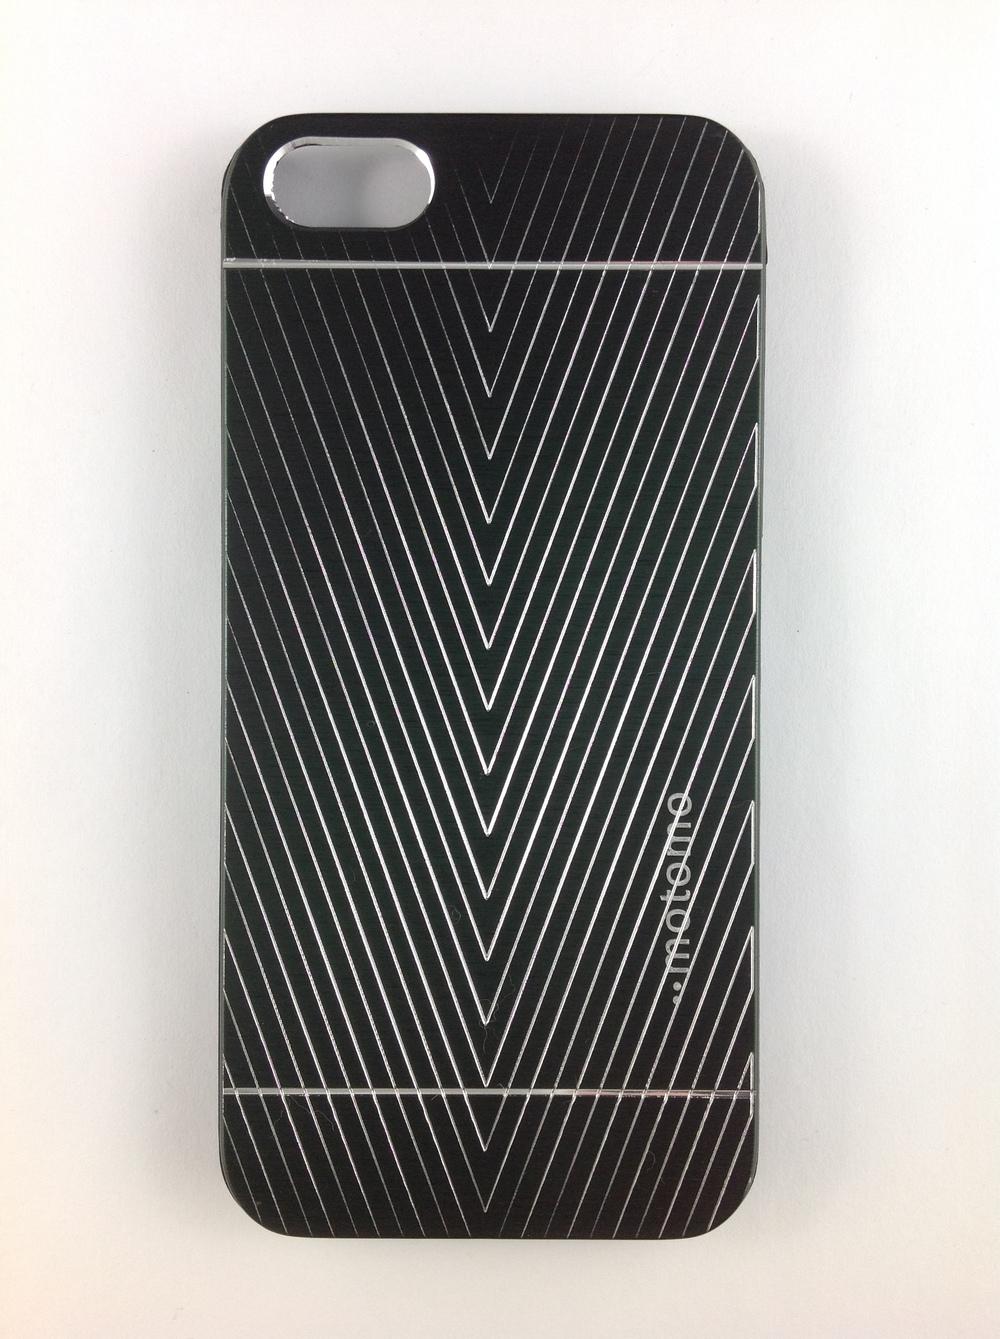 DigitalCarver-iPhone5s-IMG_3691.JPG